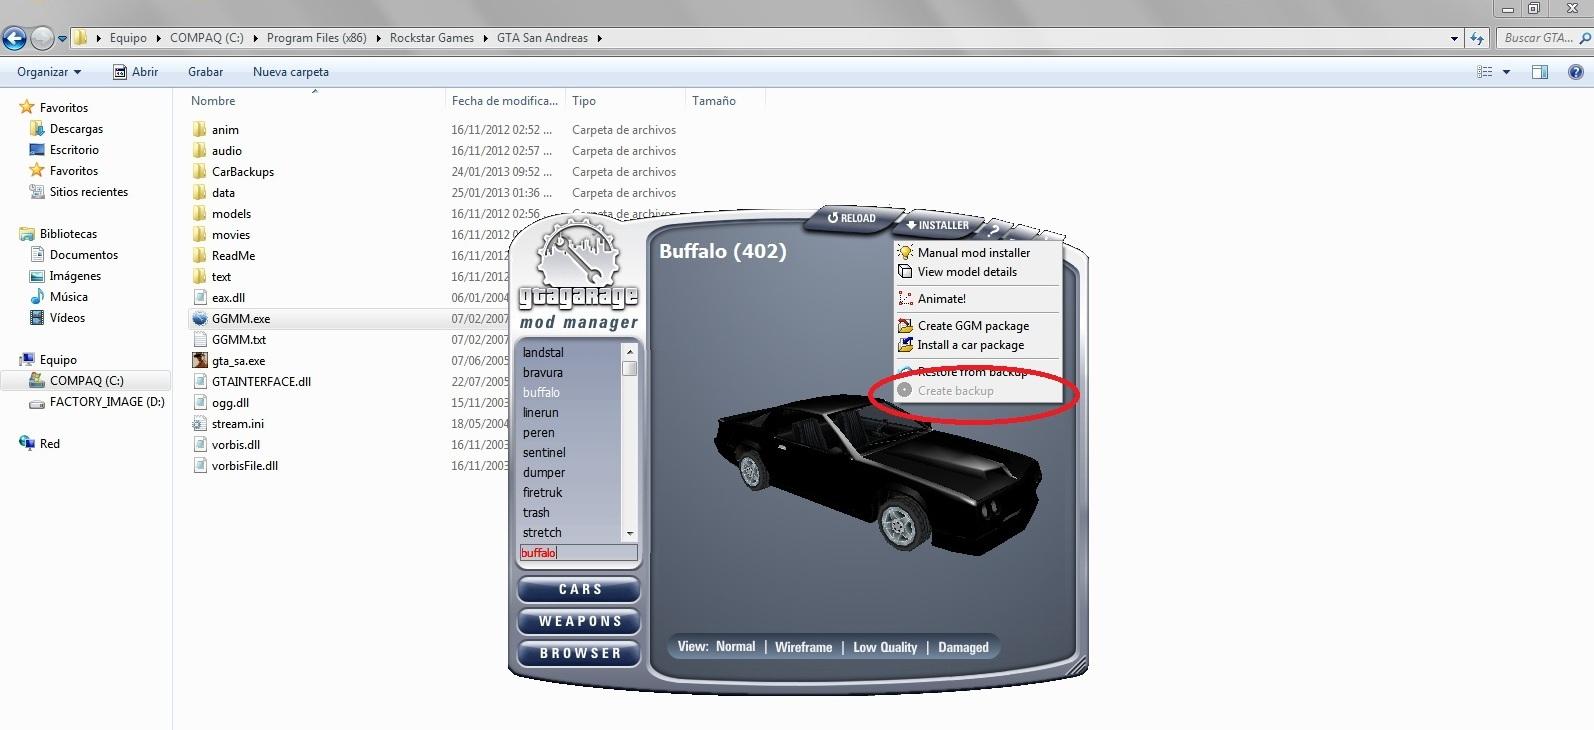 TUTORIAL] How to install car mods with GGMM - Scripting & Modding